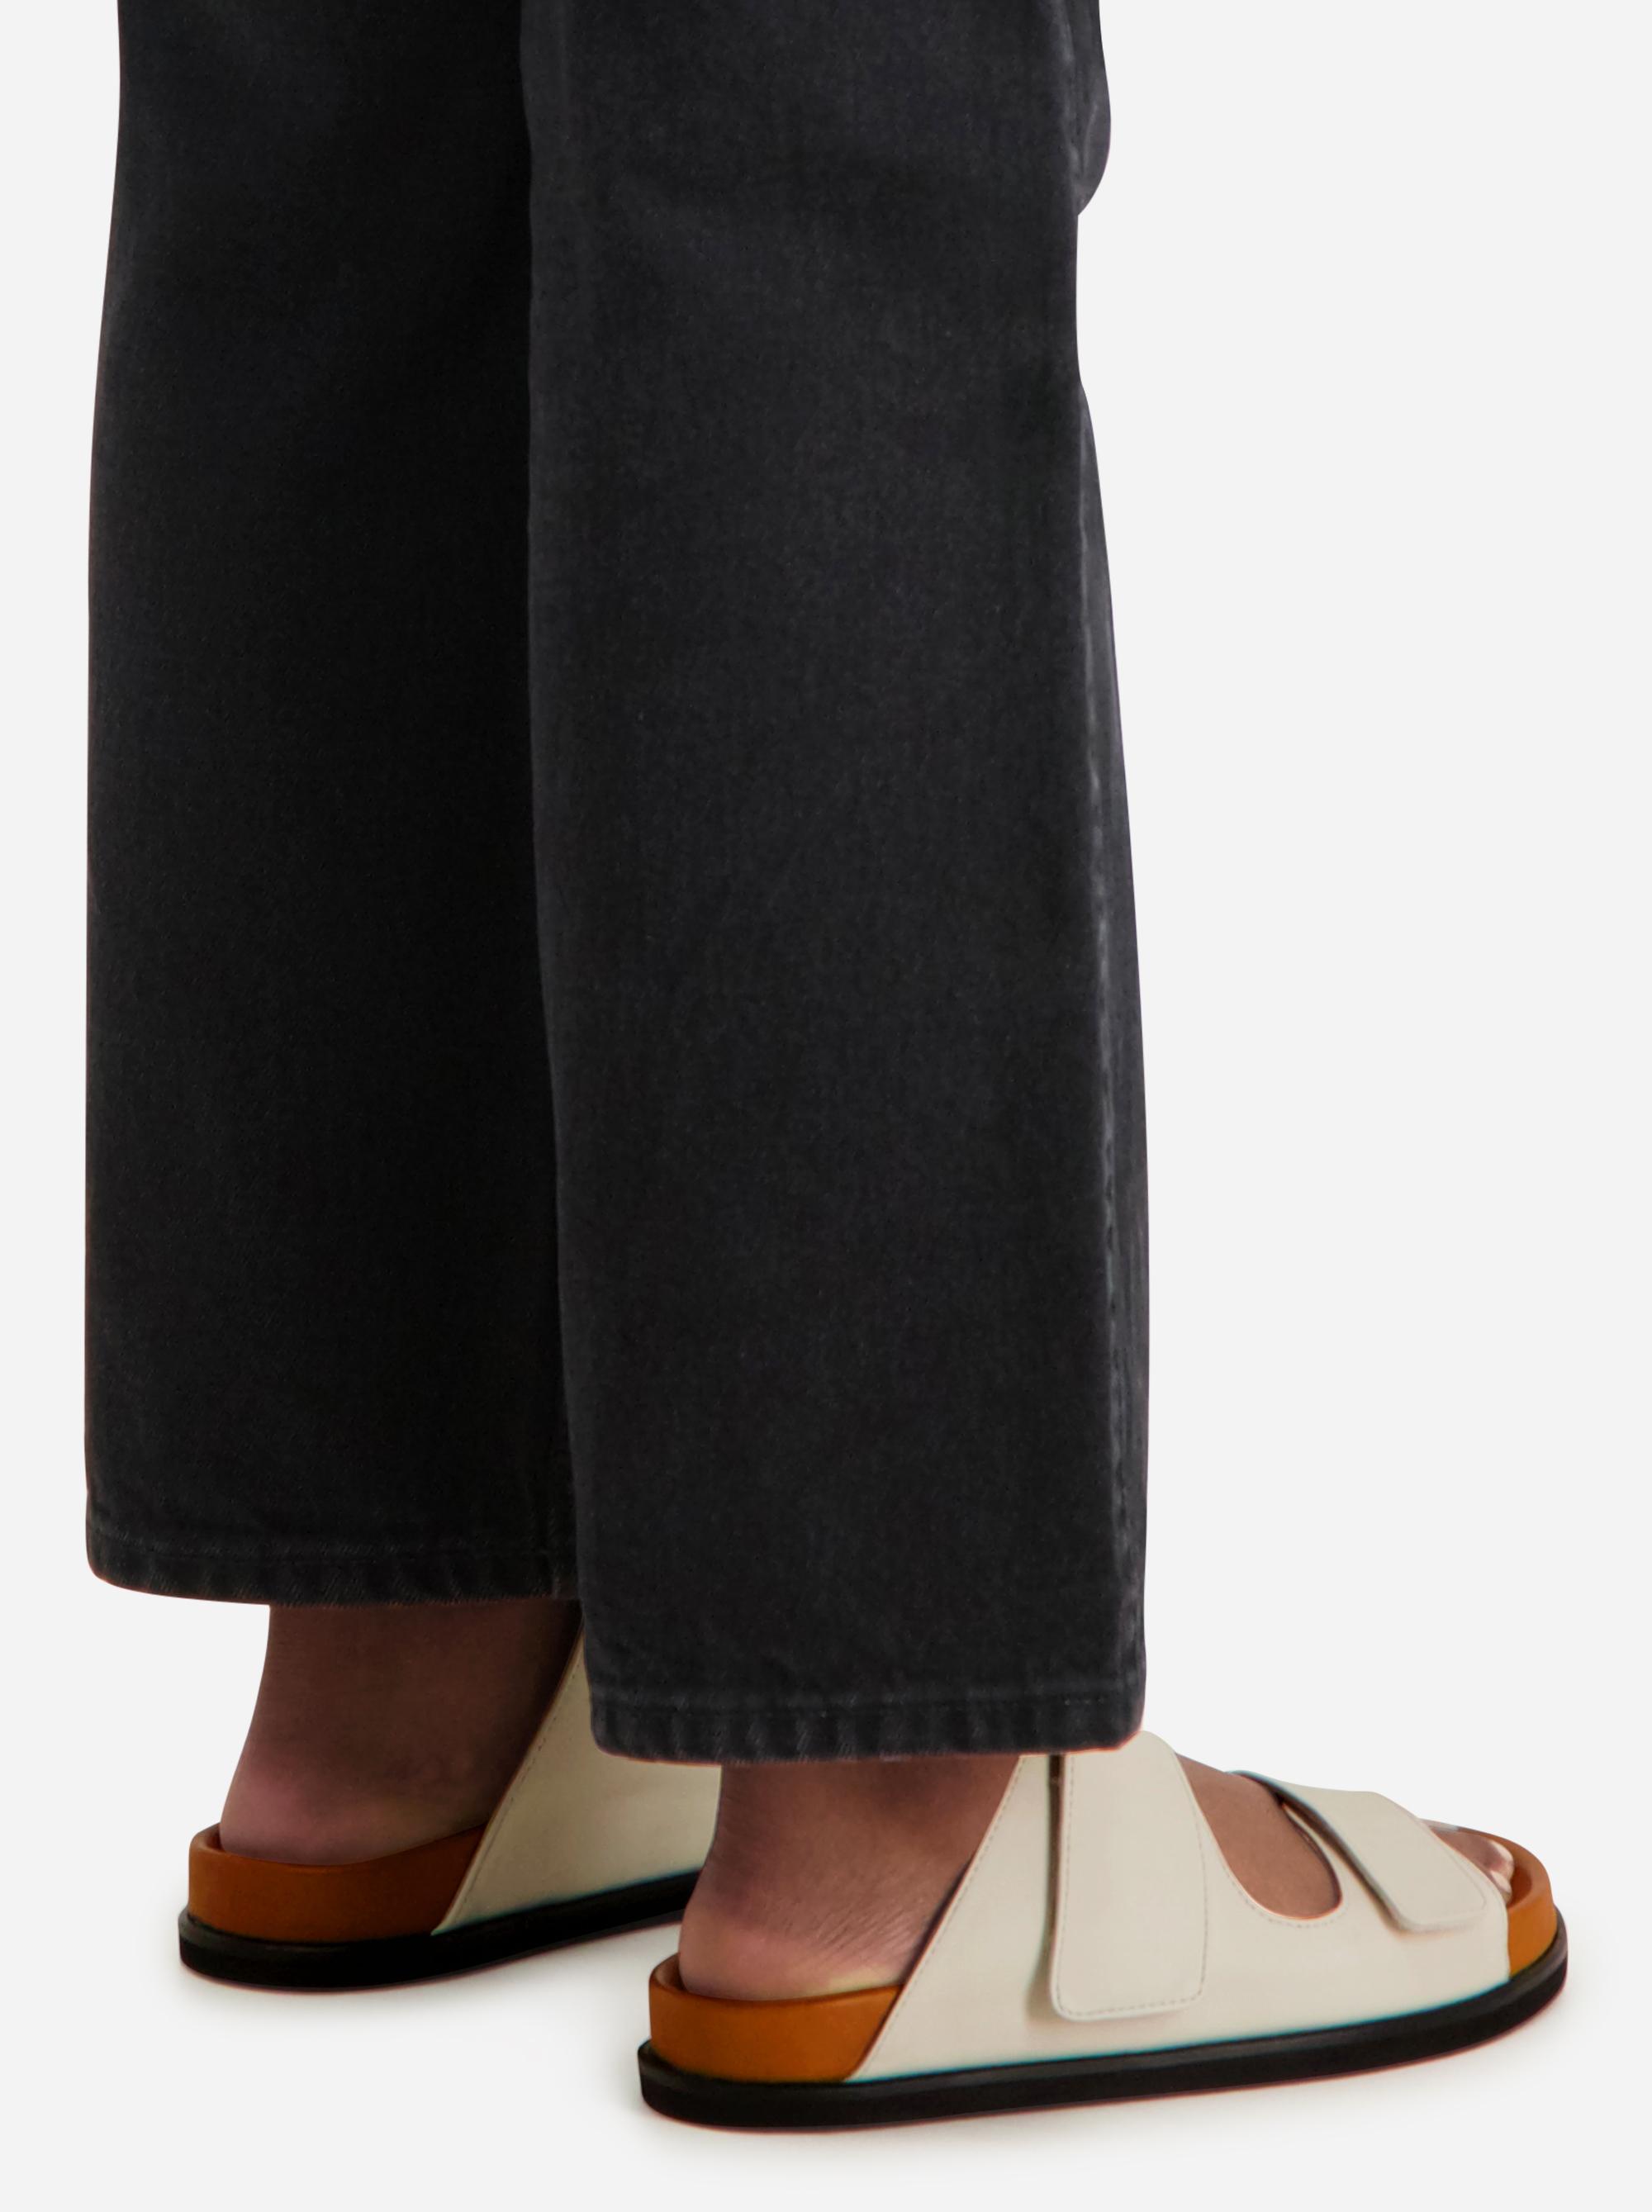 Teym - The Sandal - White - Women - 1